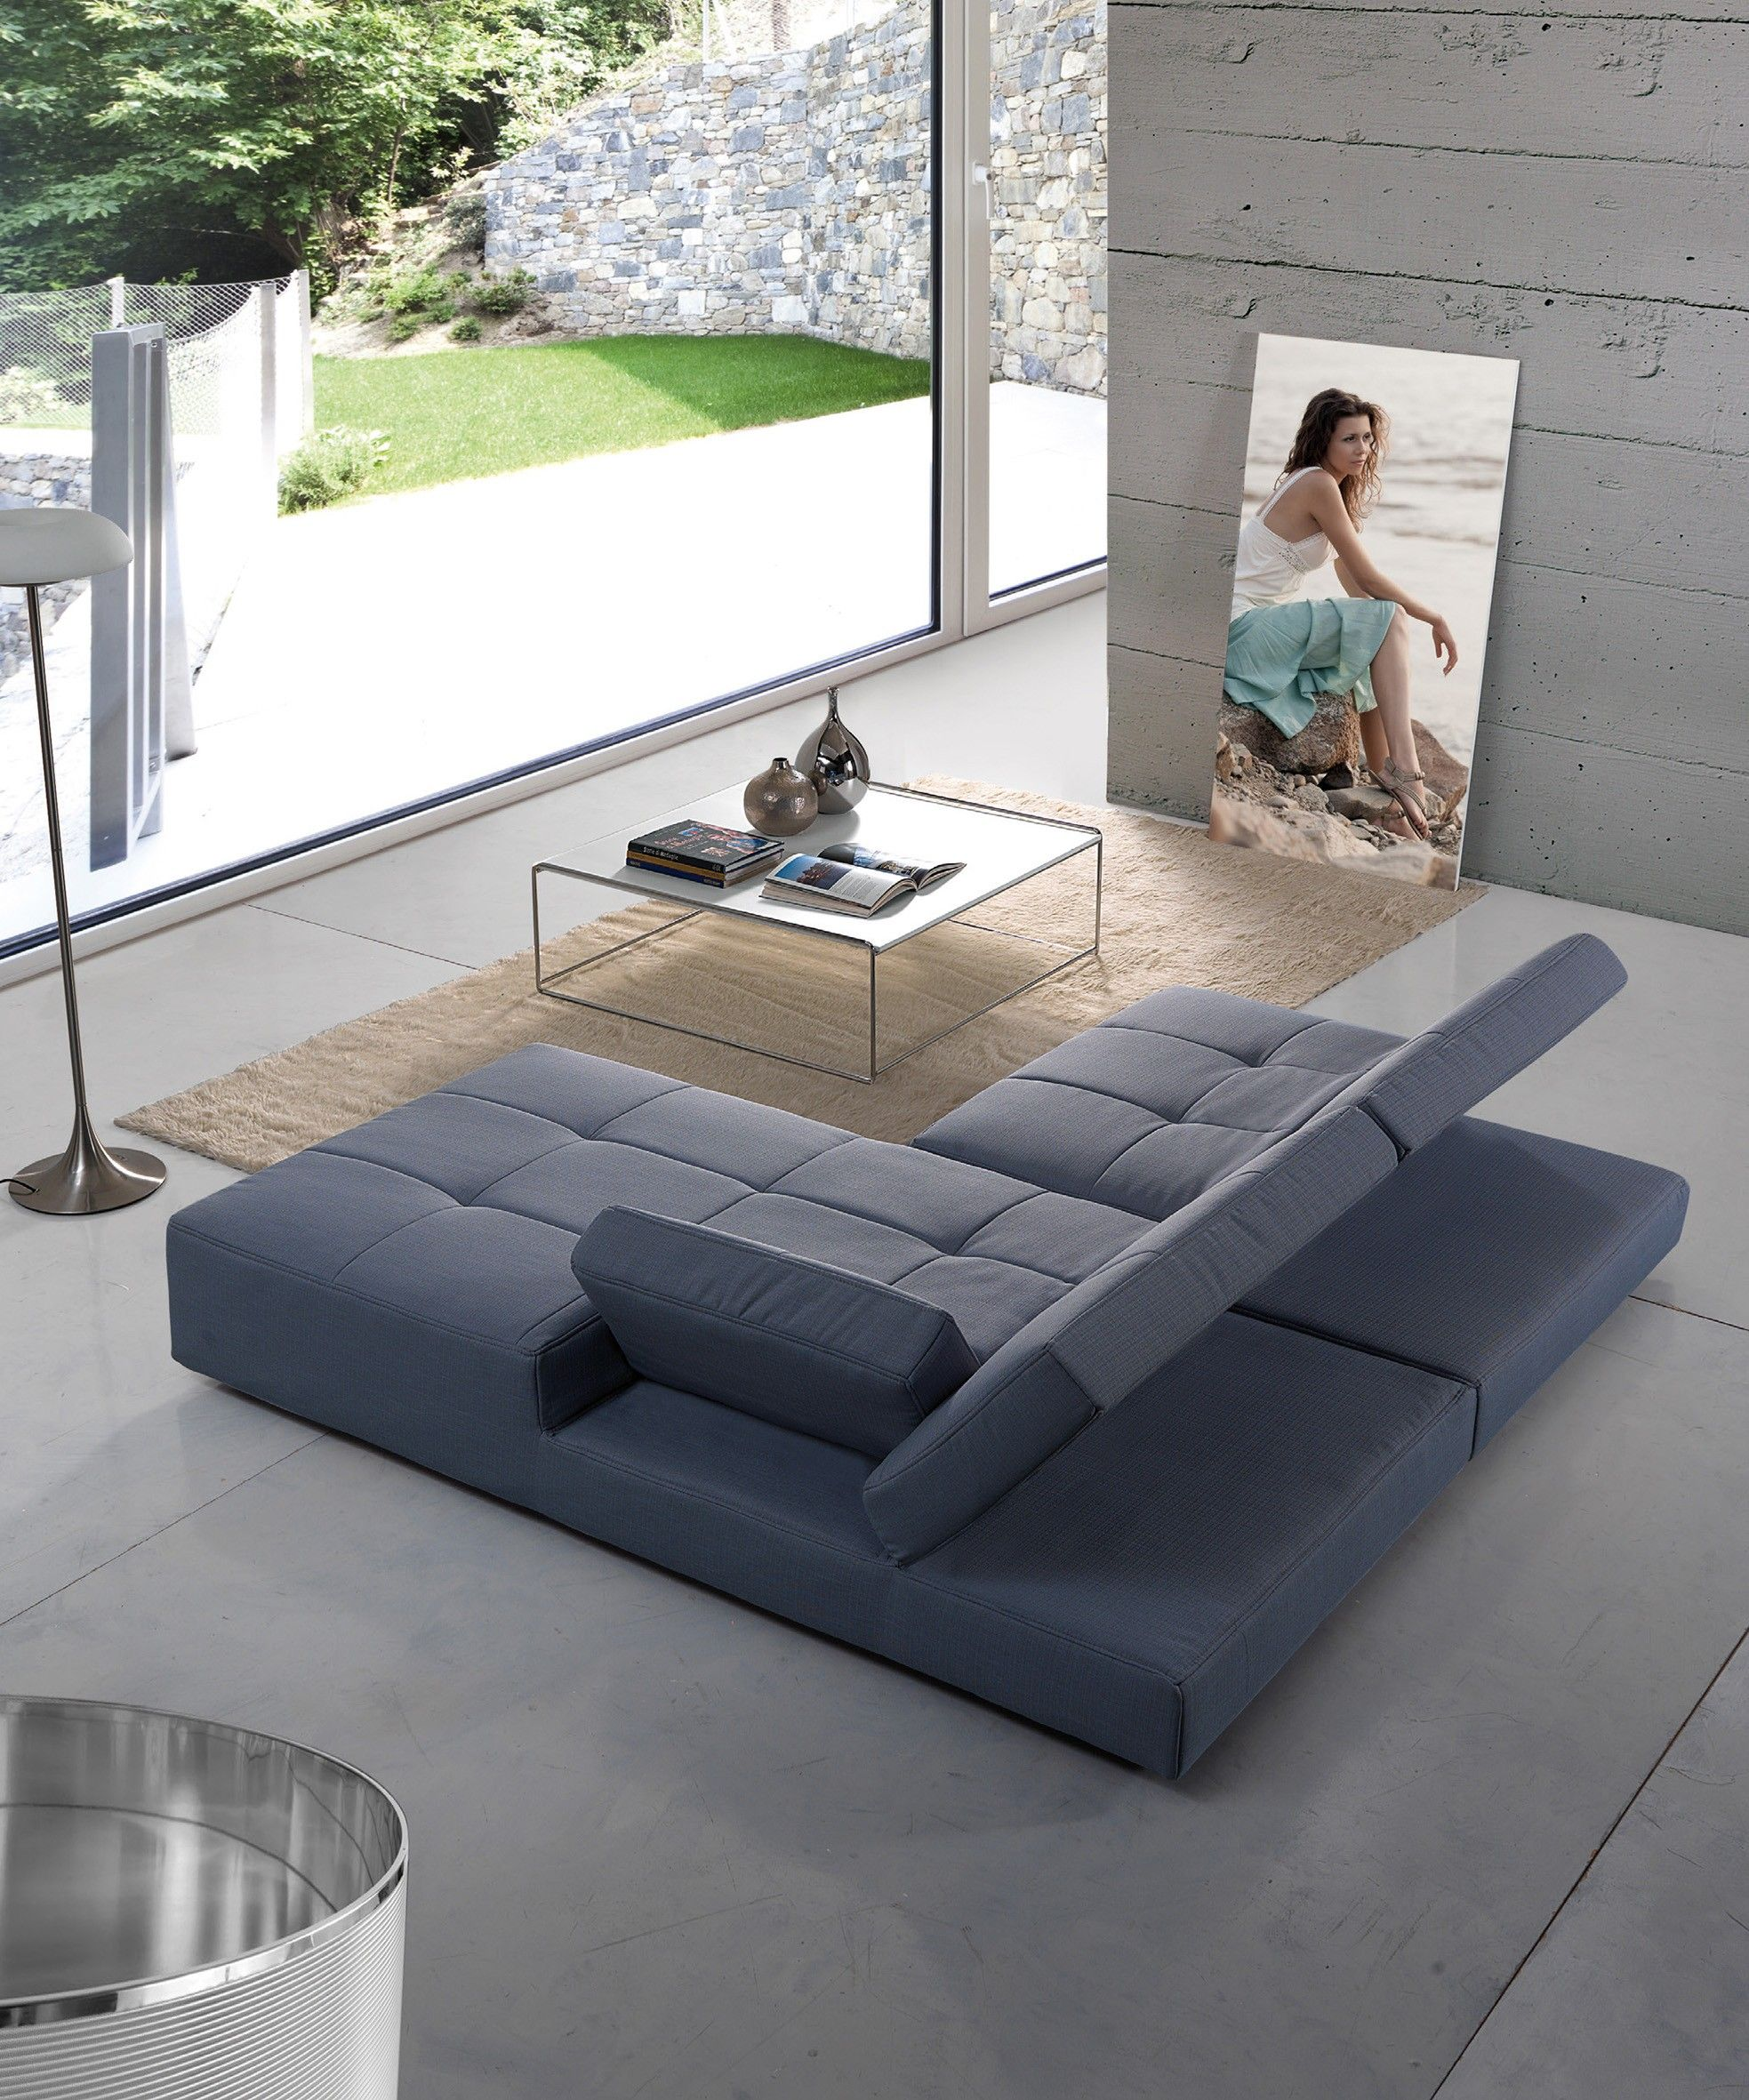 Dreams4Home Polsterecke U Form Mike XXL Big Sofa Ecksofa Couch